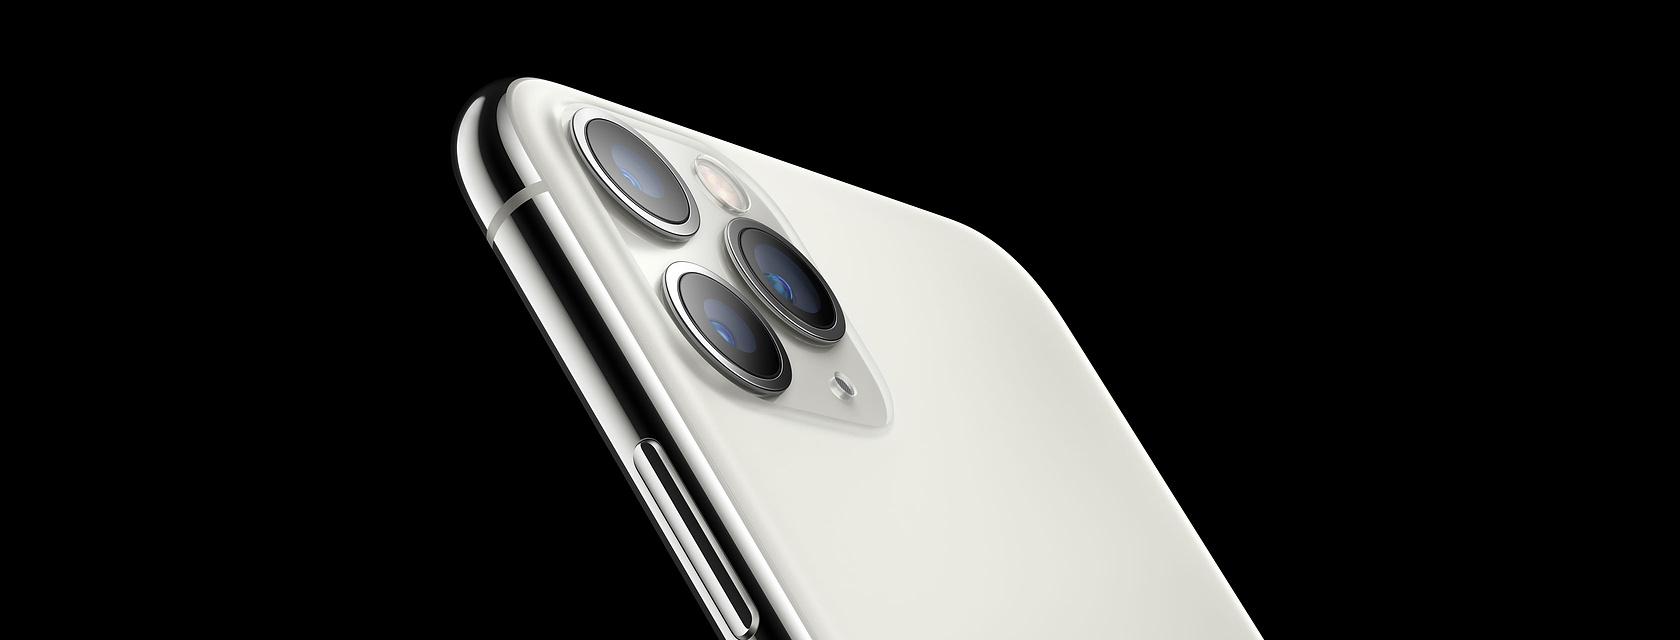 айфон 11 про макс 512 серебристый